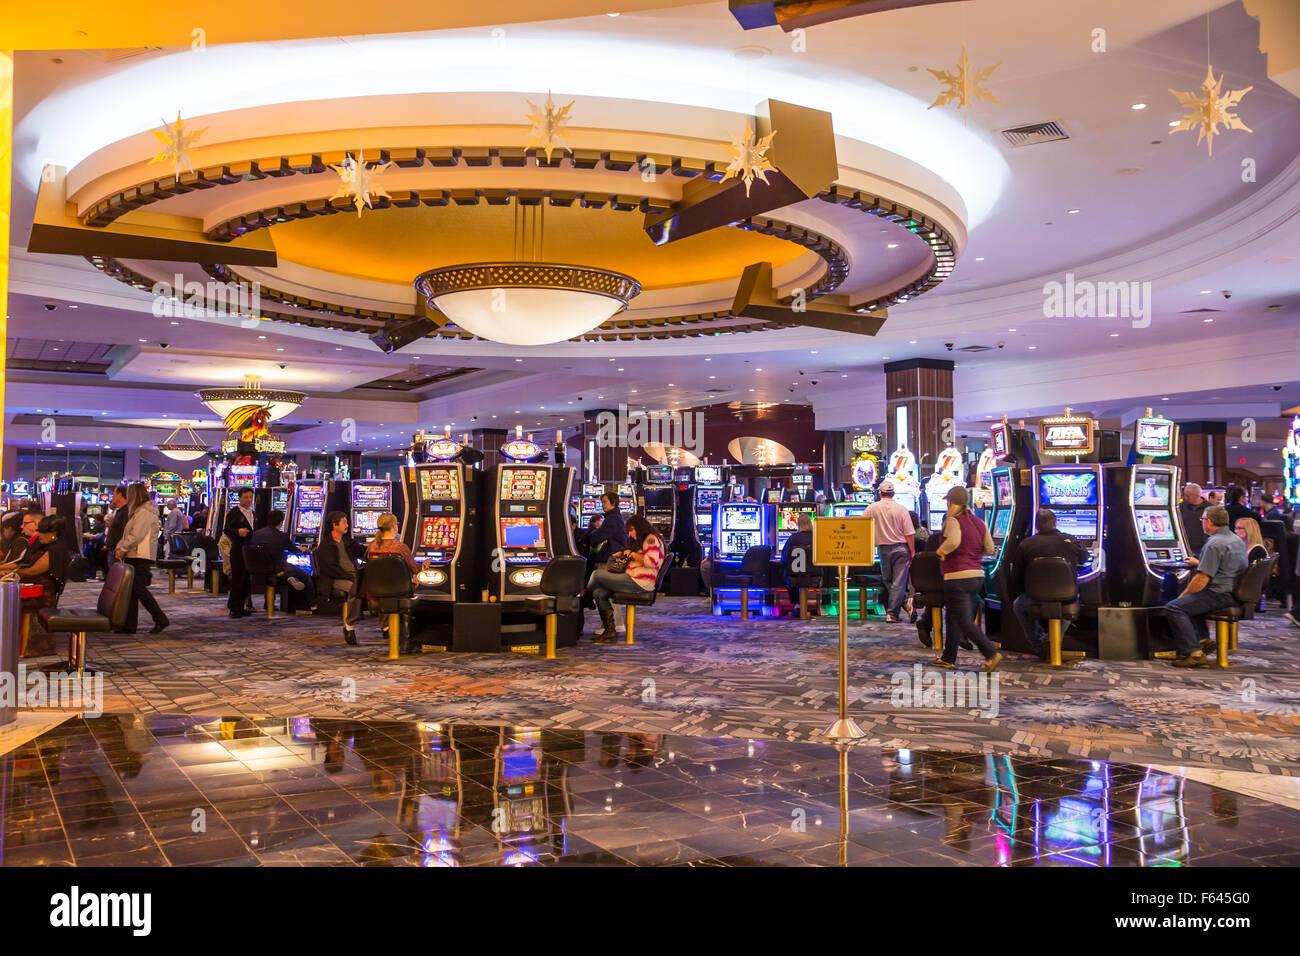 Casino foxwood gambling hotel casino downloading game no online